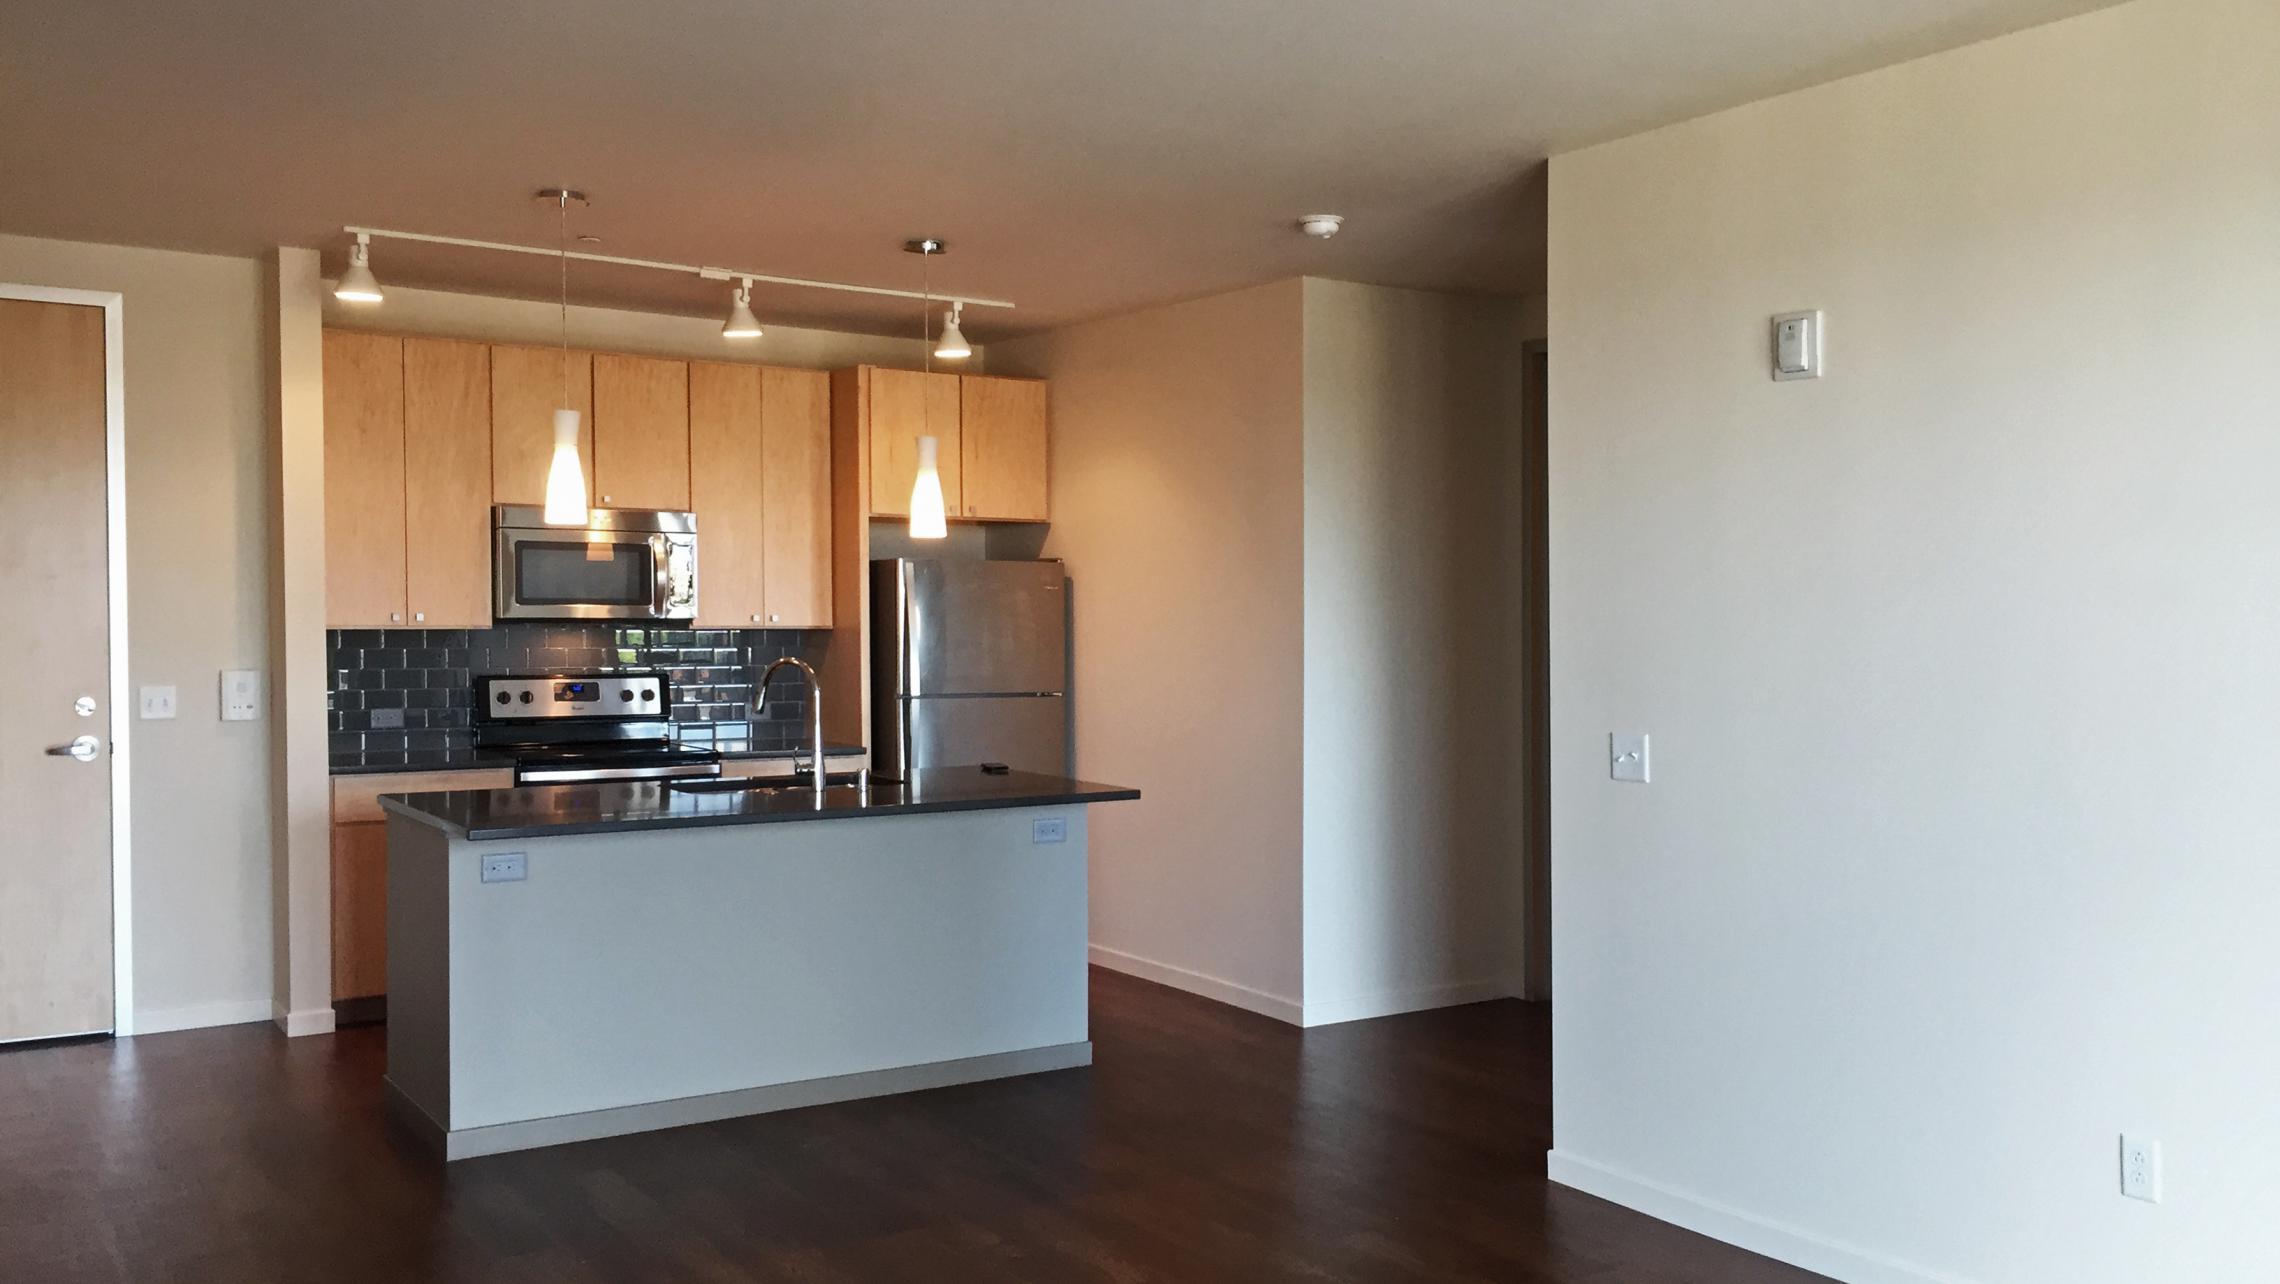 ULI Nine Line Apartment 519 - Kitchen